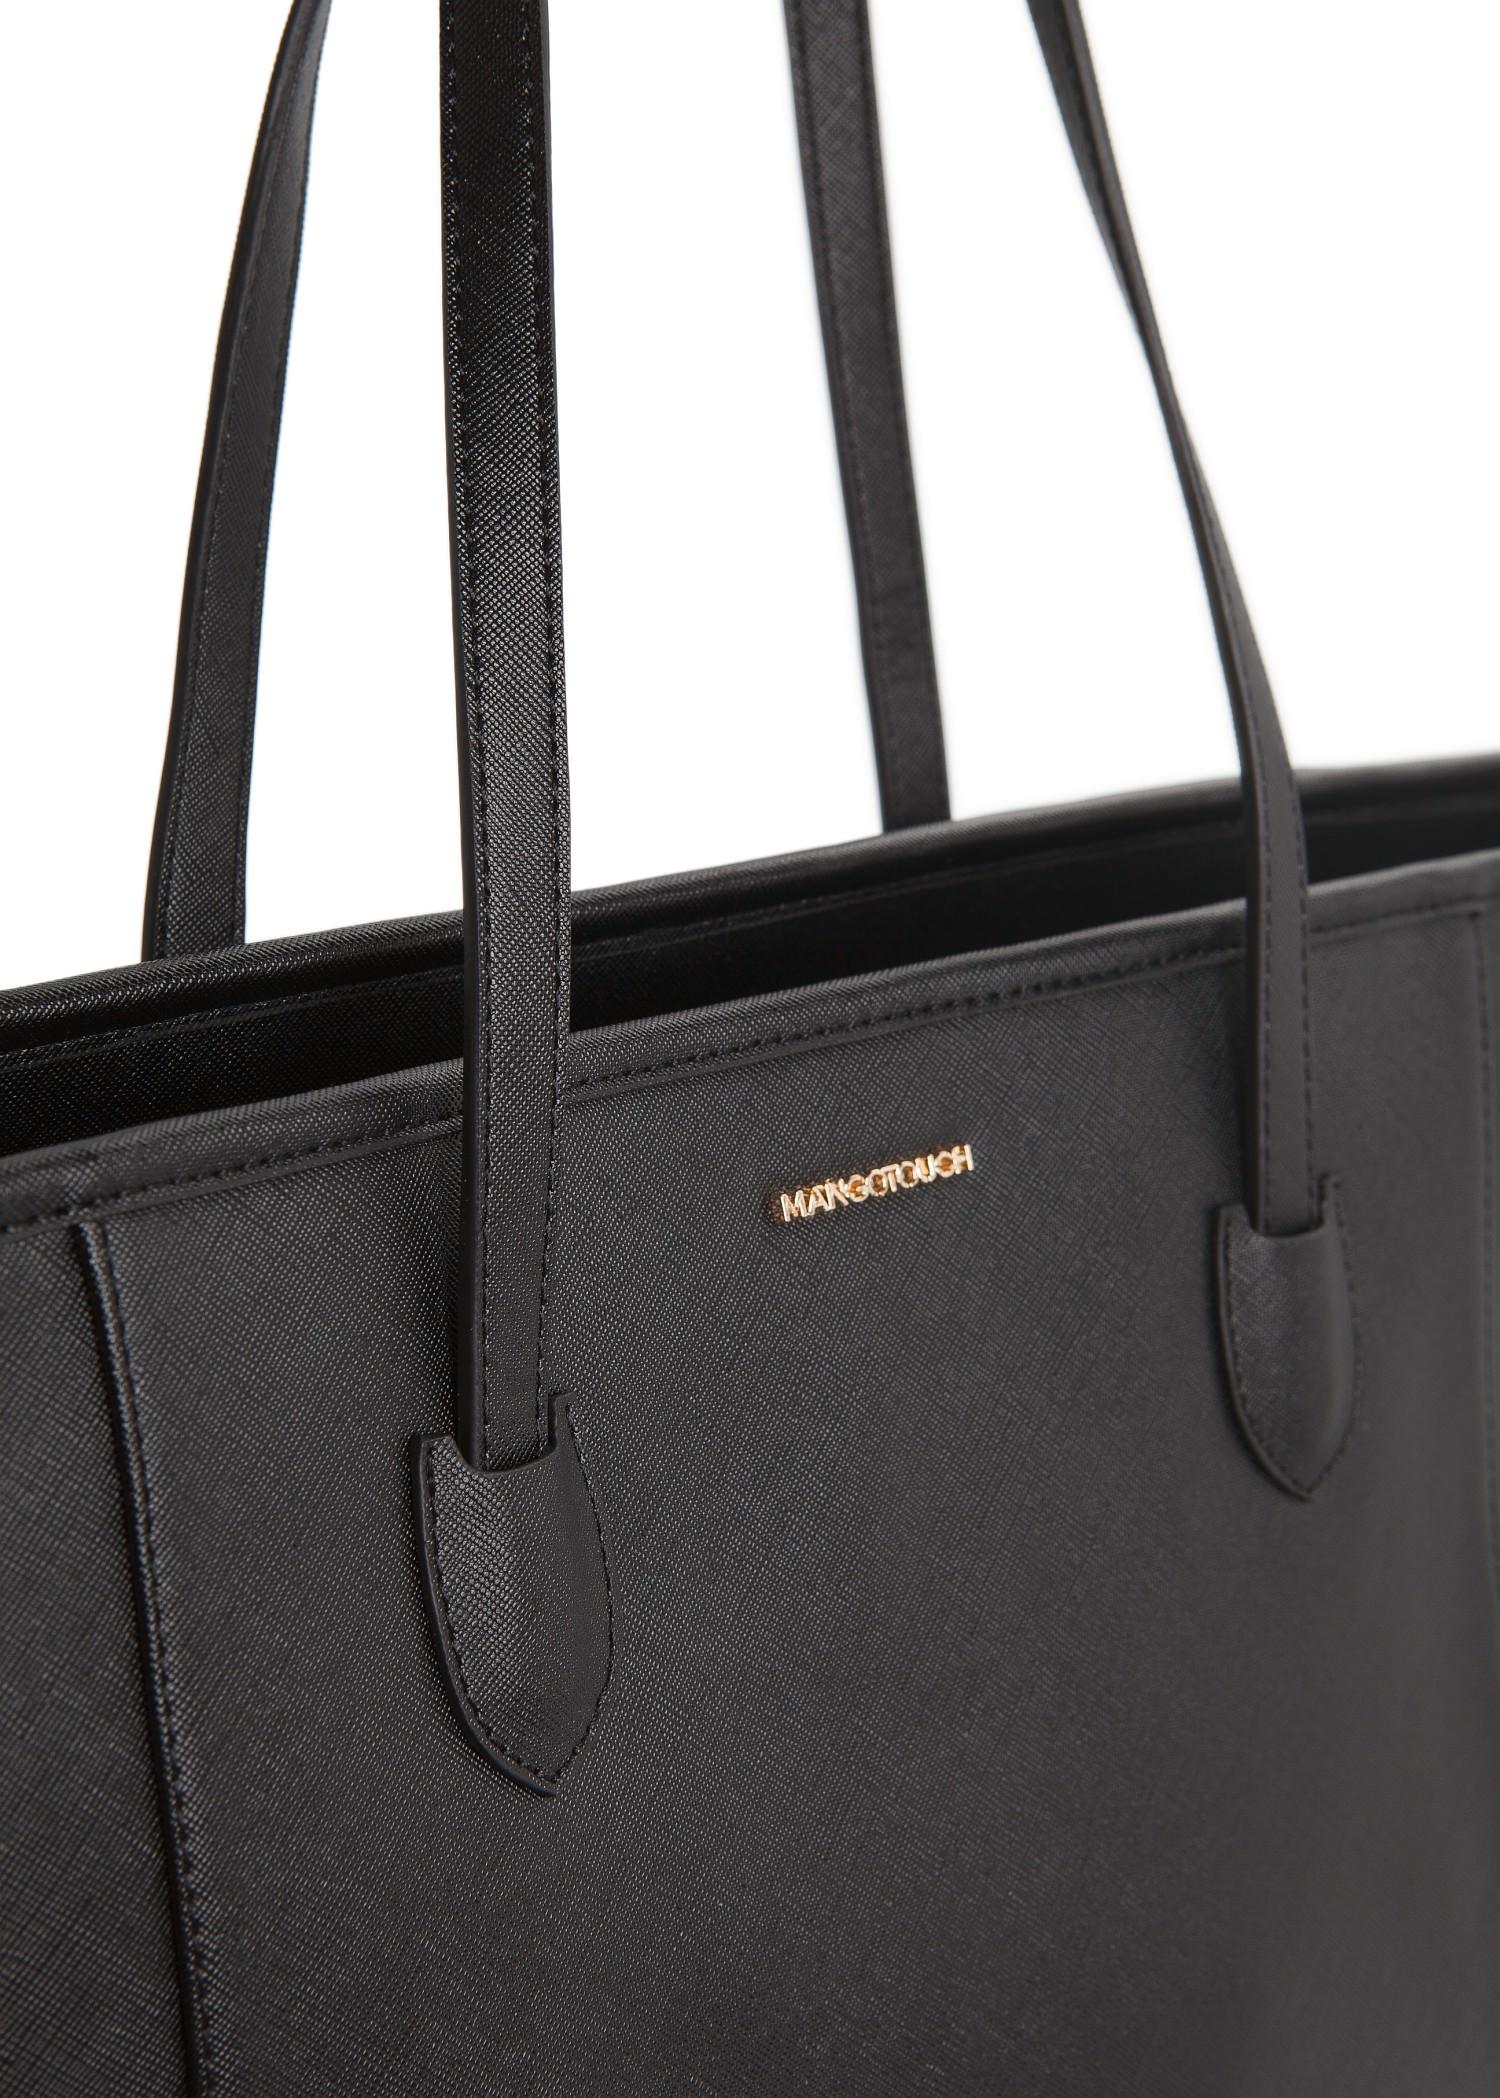 Mango Saffiano-Effect Faux-Leather Shopper in Black | Lyst